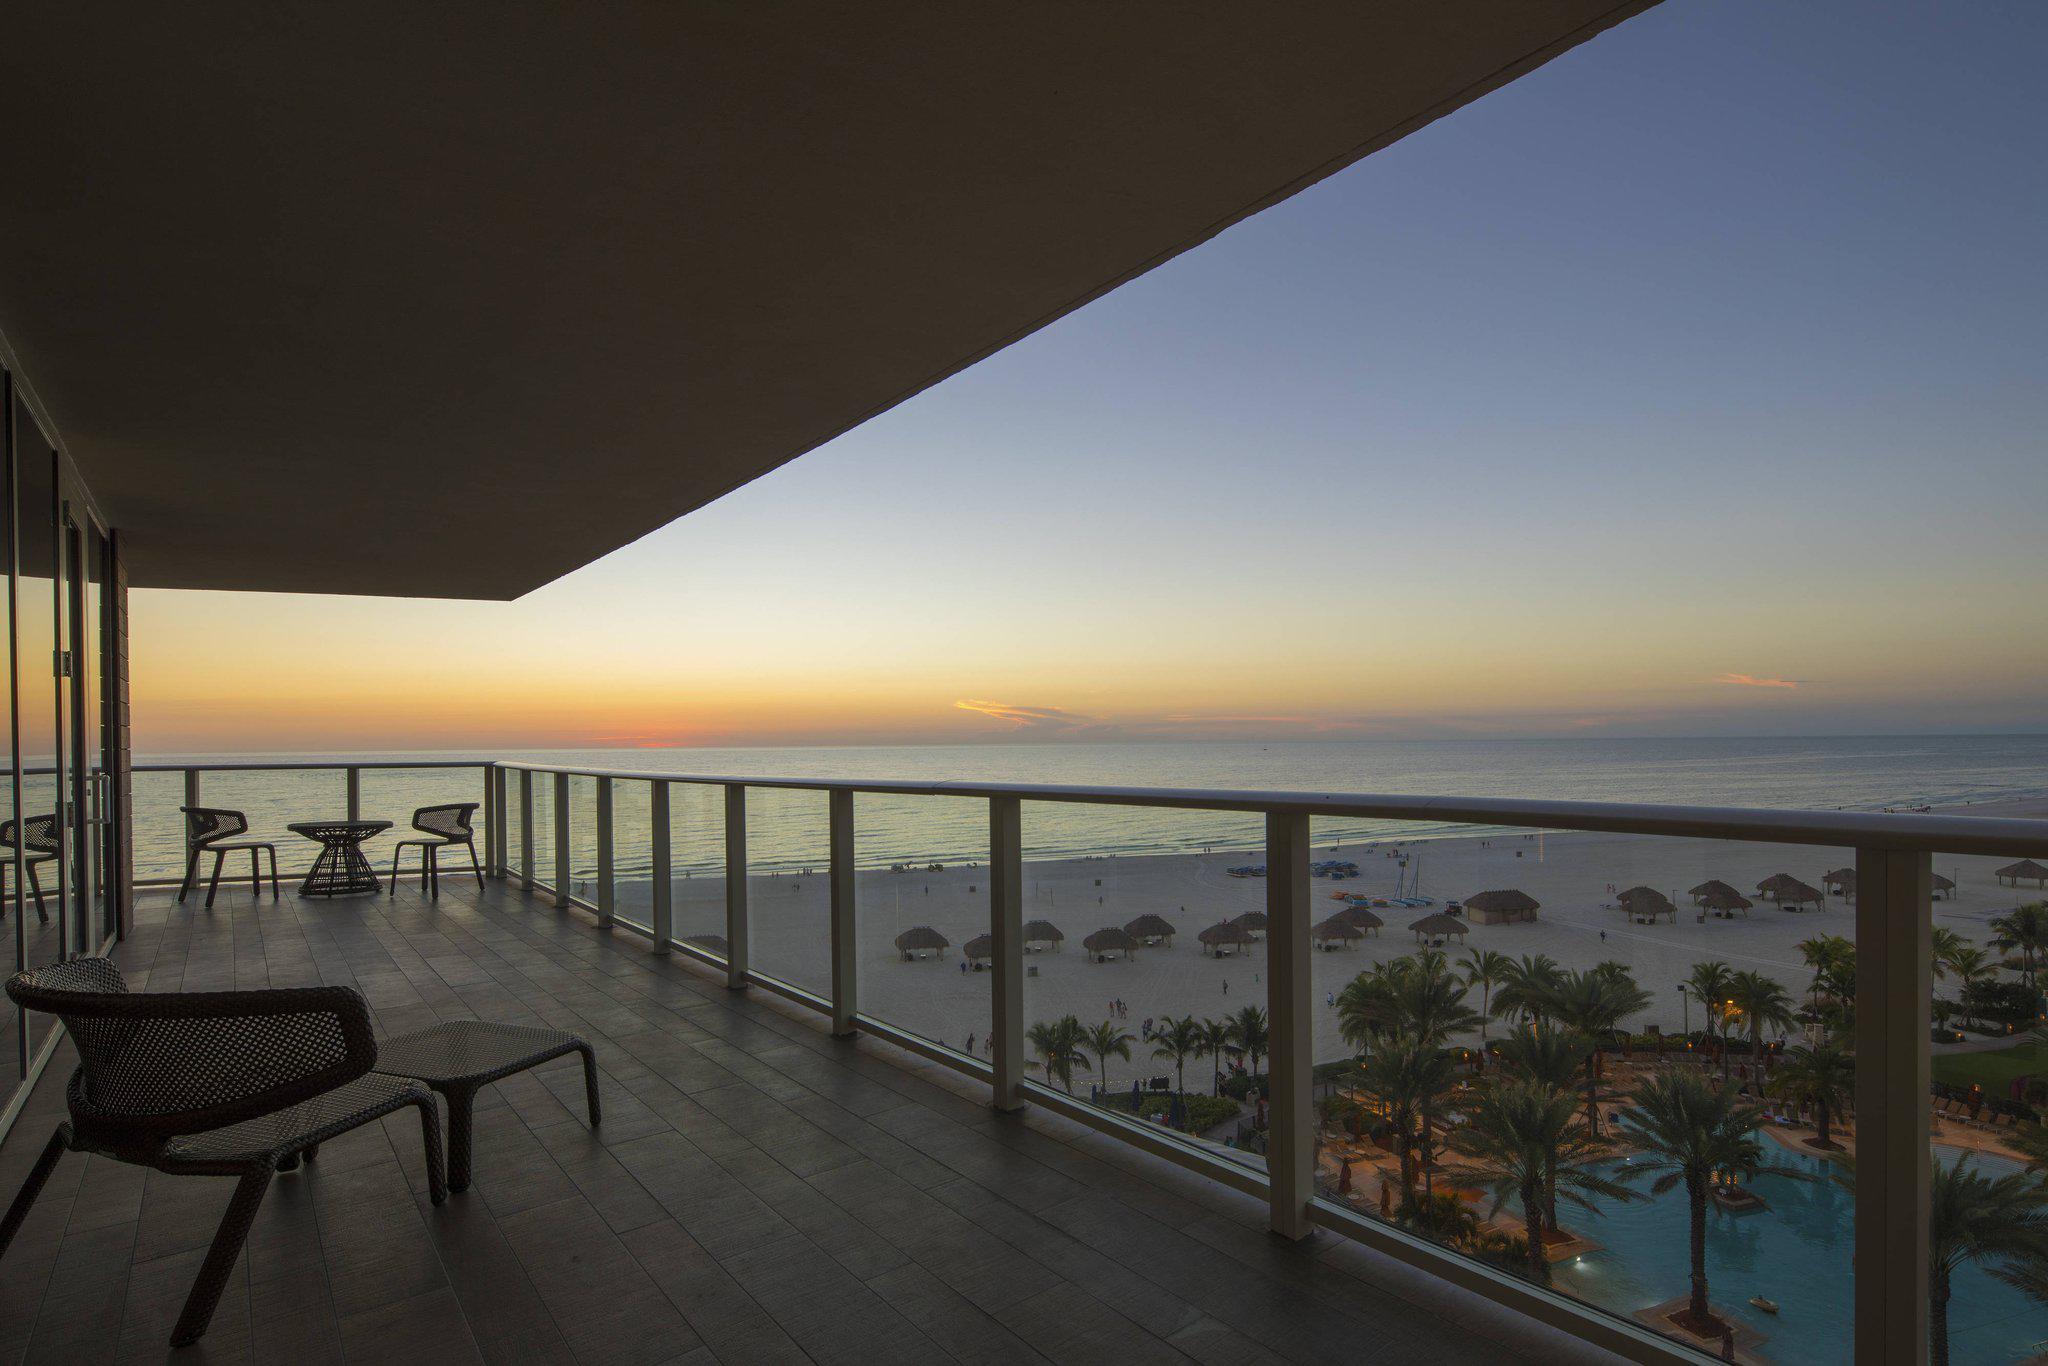 JW Marriott Marco Island Beach Resort